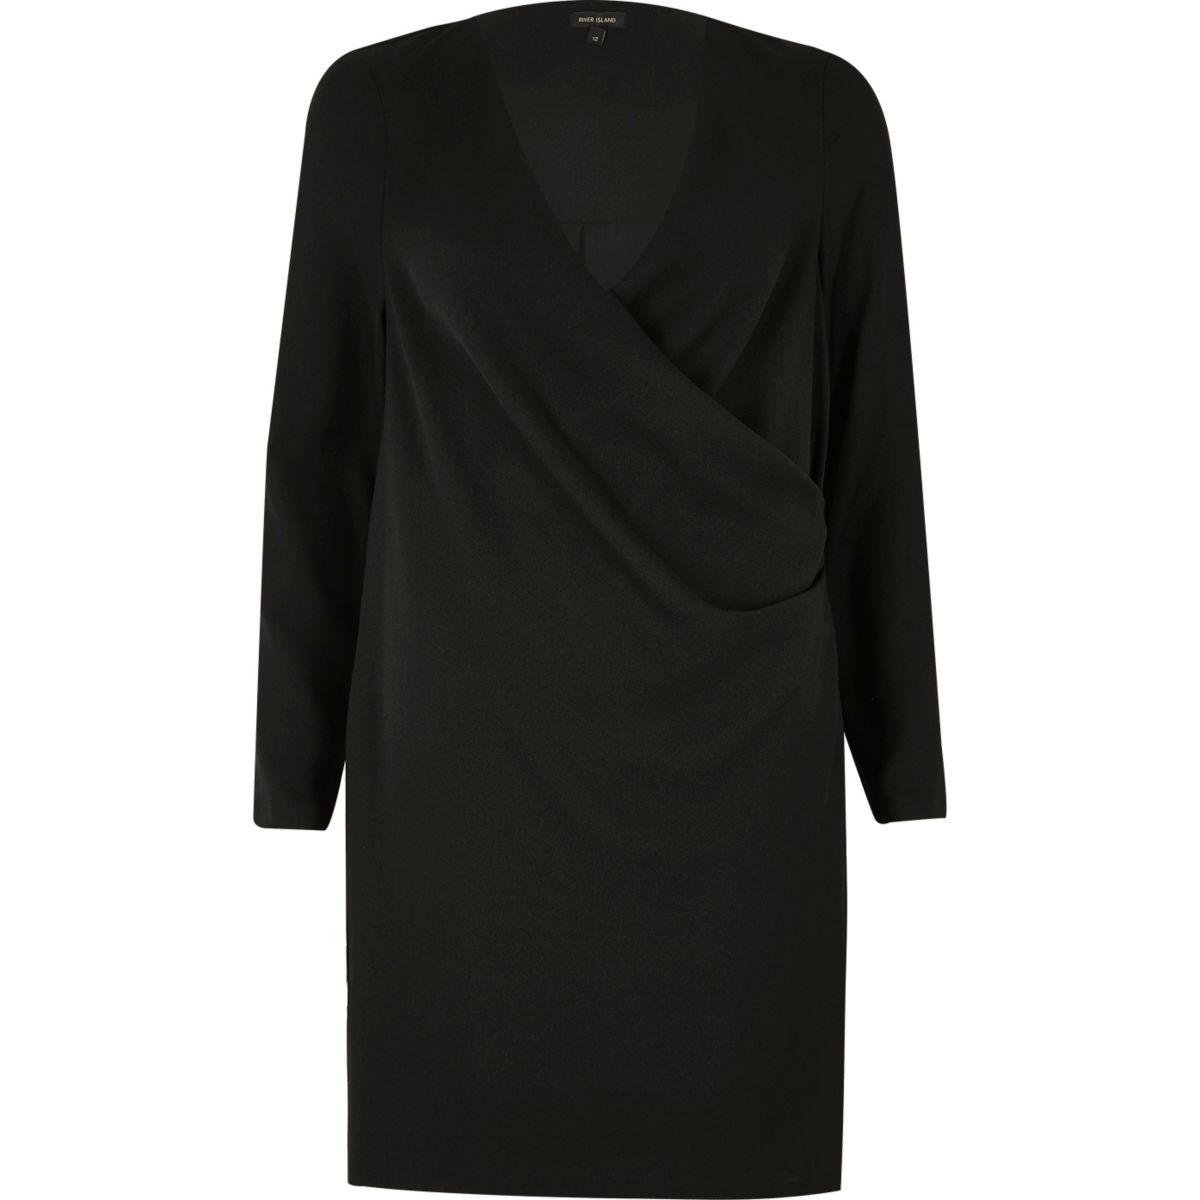 Black draped swing dress